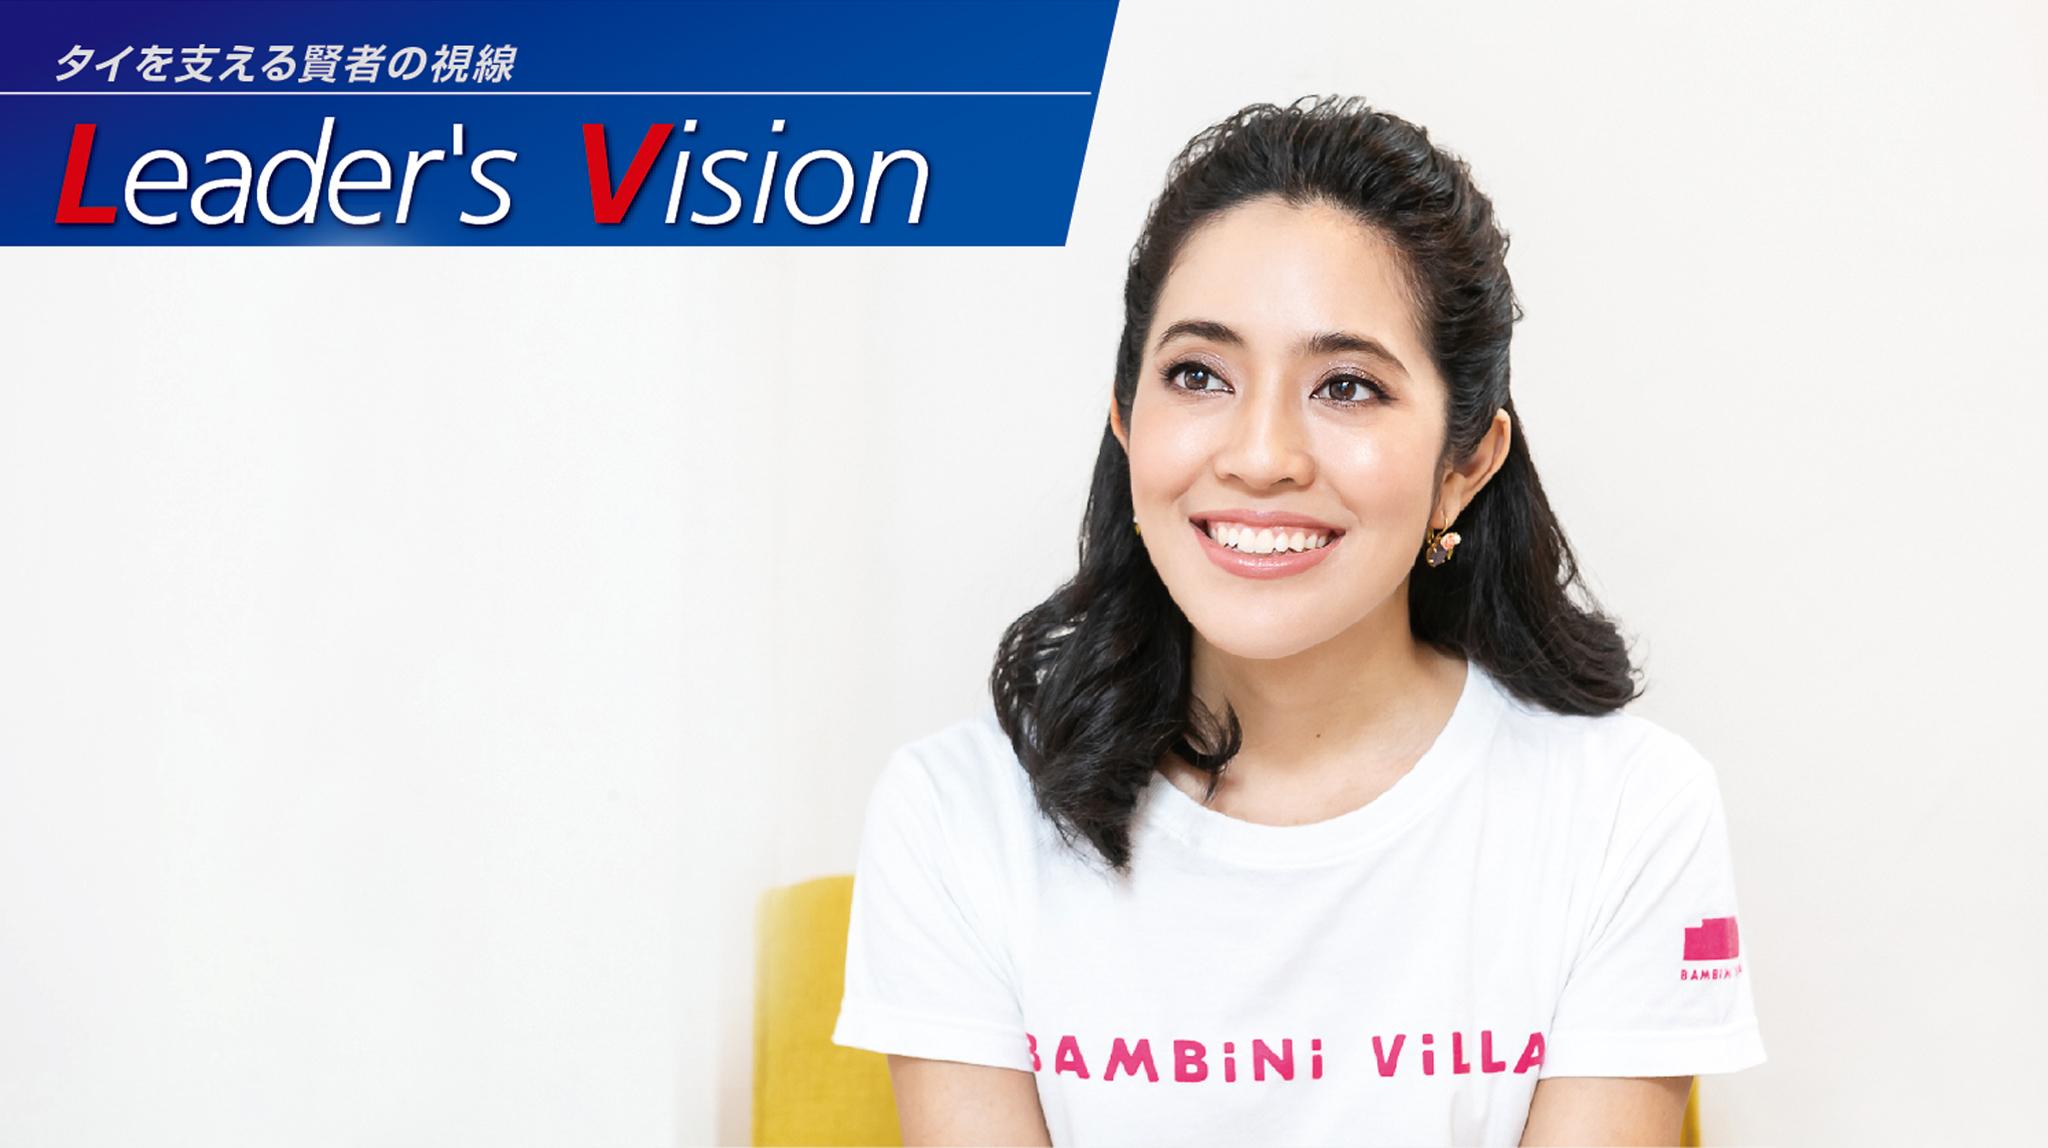 "BAMBiNi ViLLA ー คอมมูนิตี้มอลล์เพื่อการเรียนรู้ที่สามารถ ""สนุกกันได้ทั้งครอบครัว"" - ワイズデジタル【タイで生活する人のための情報サイト】"